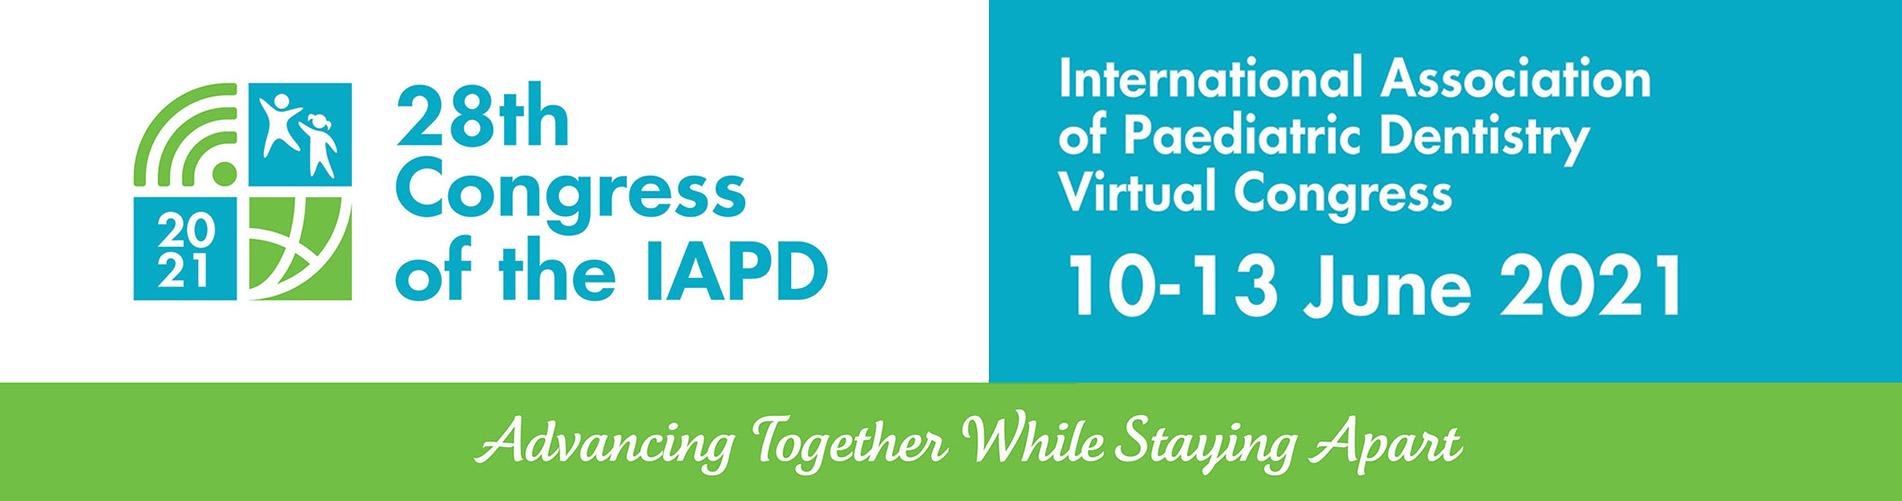 Dental Congress | Welcome to the 28th IAPD Congress | IAPD